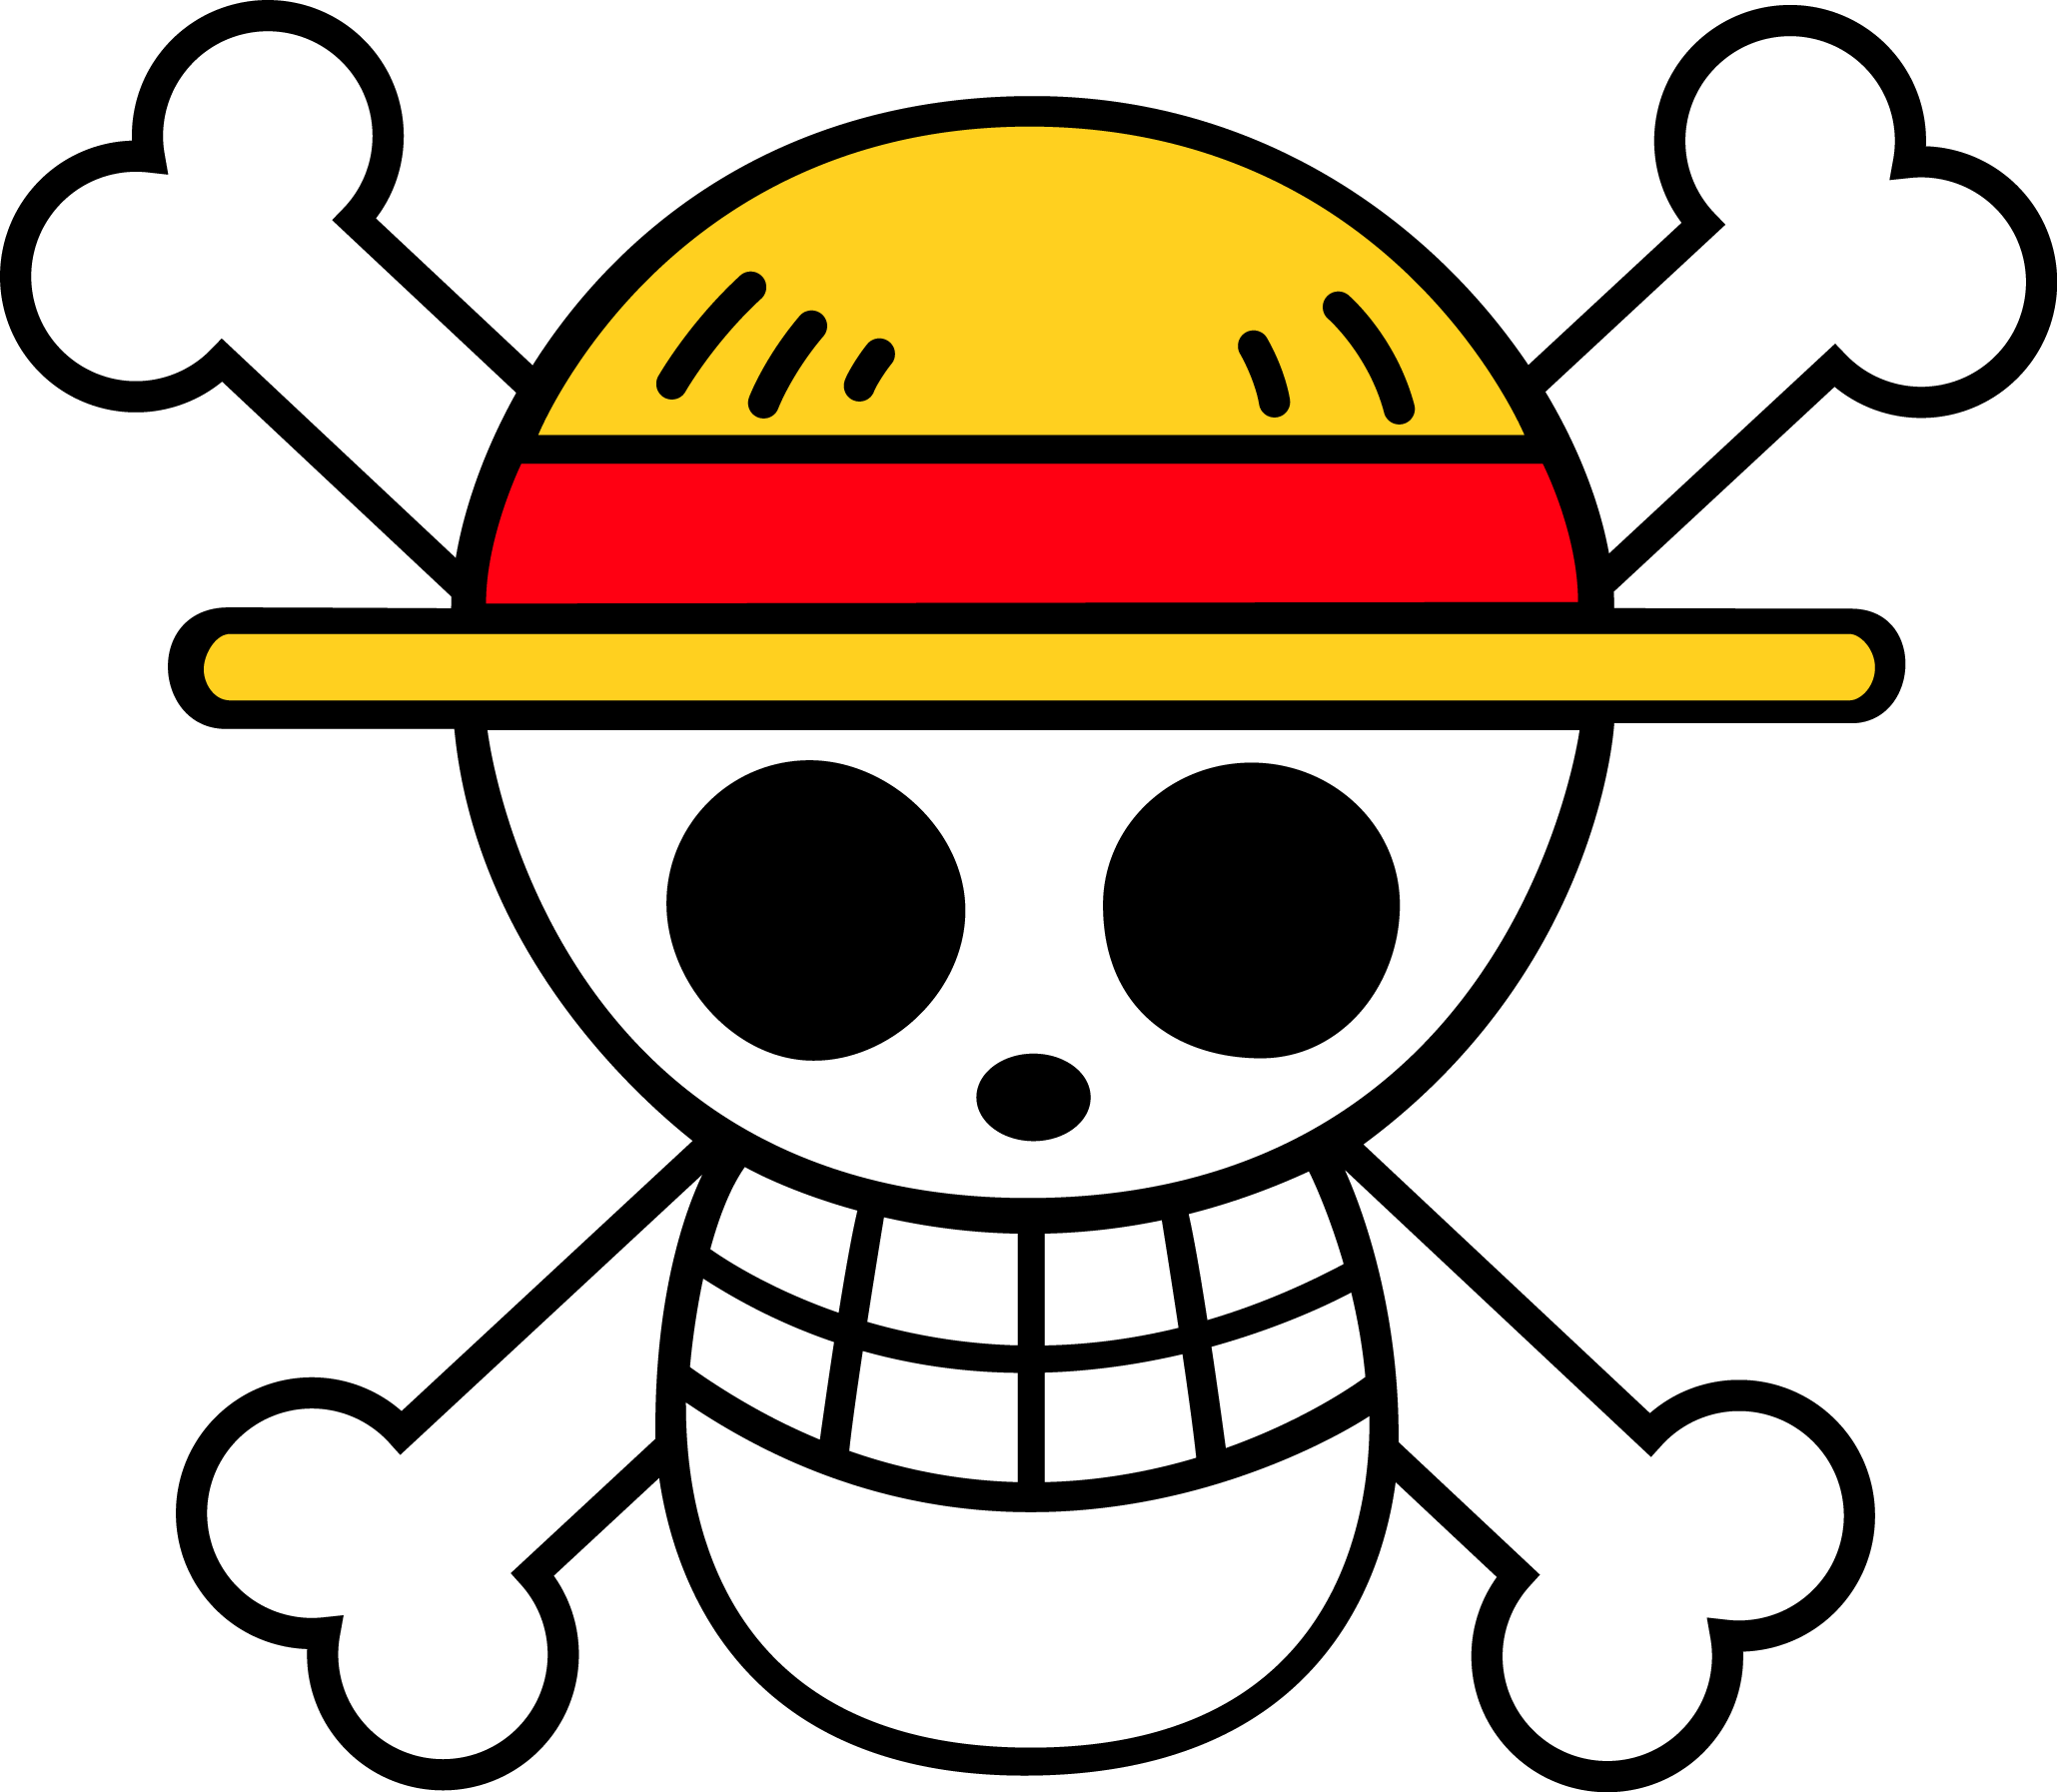 Monkey D Luffy One Piece Gambar Bajak Laut